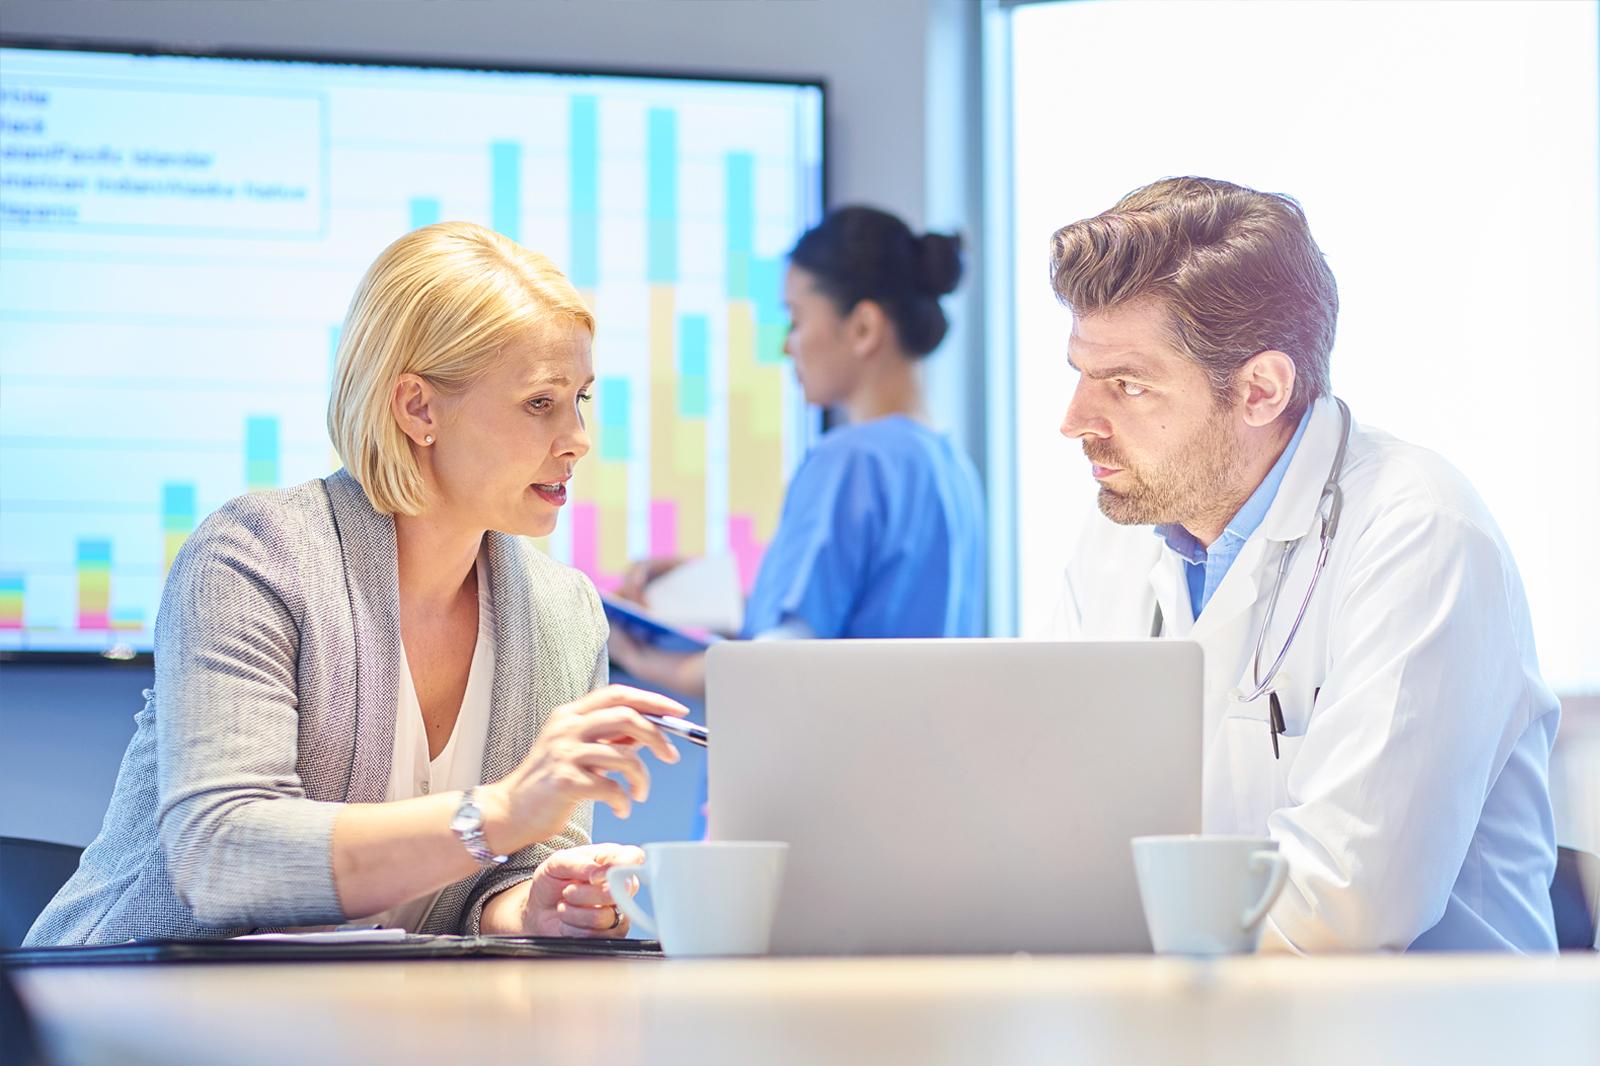 Health Economics - Online Microcredential - FutureLearn